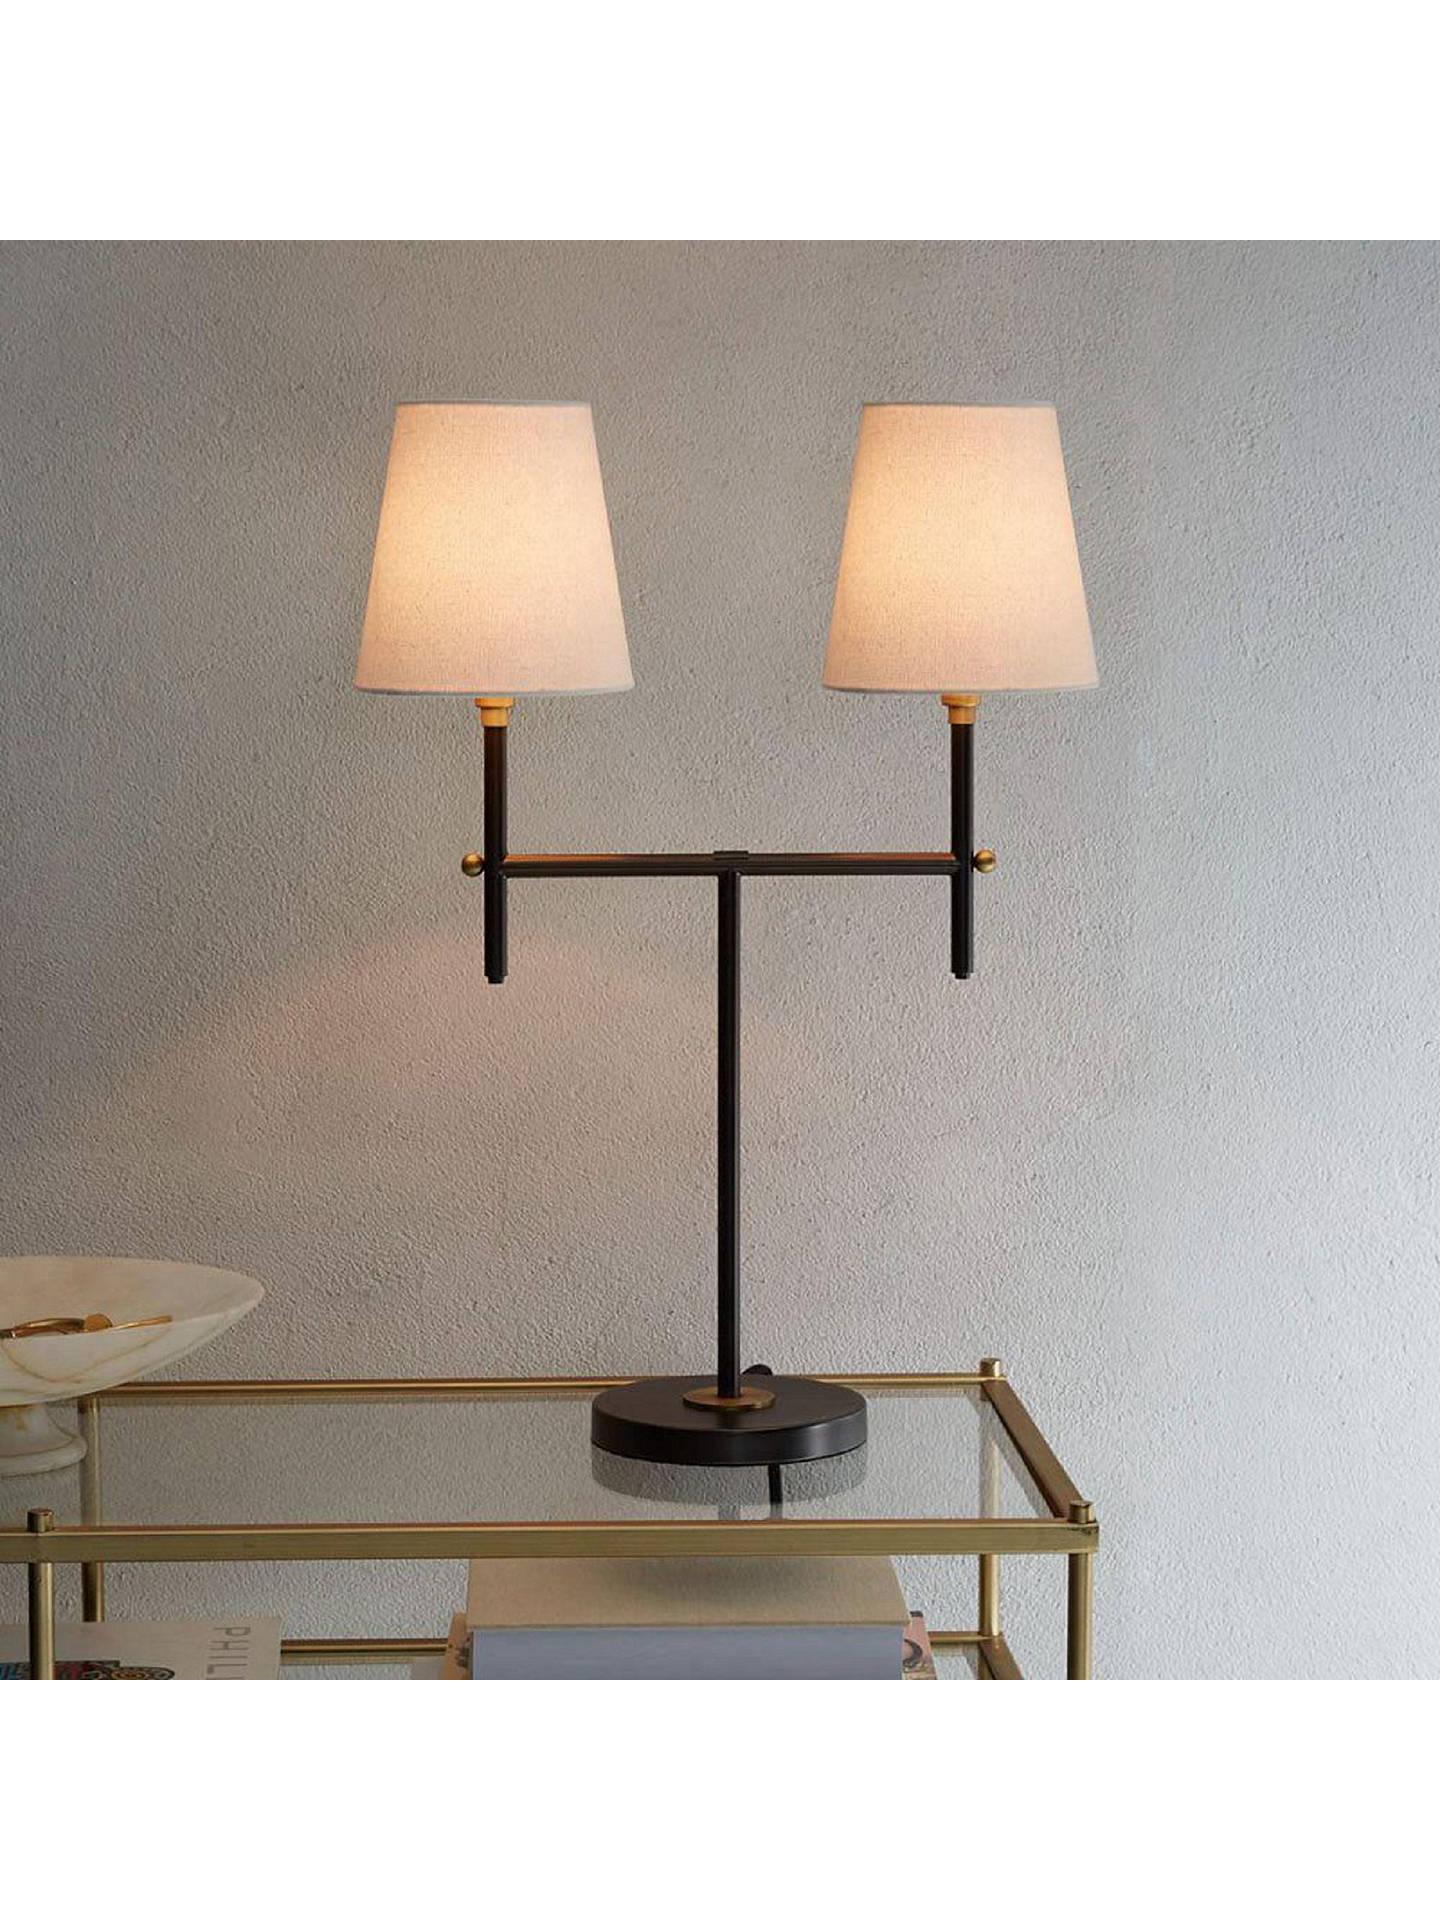 West Elm Arc 2 Arm Table Lamp Bronze At John Lewis Partners